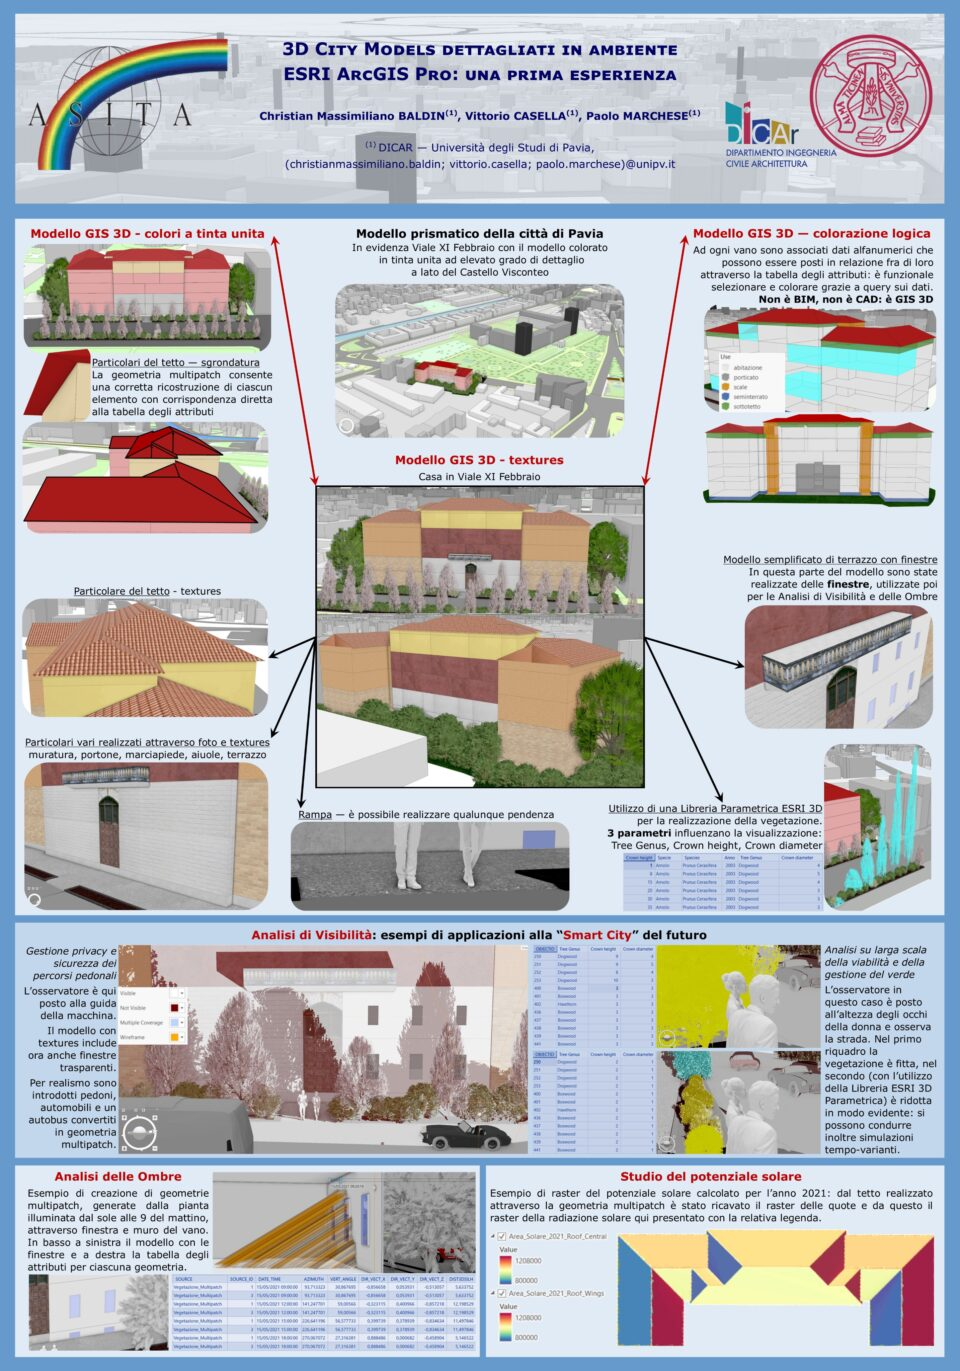 ArcGIS, 3D, CityModels, Unipv, Baldin, Casella, Marchese, Geomatica, GIS